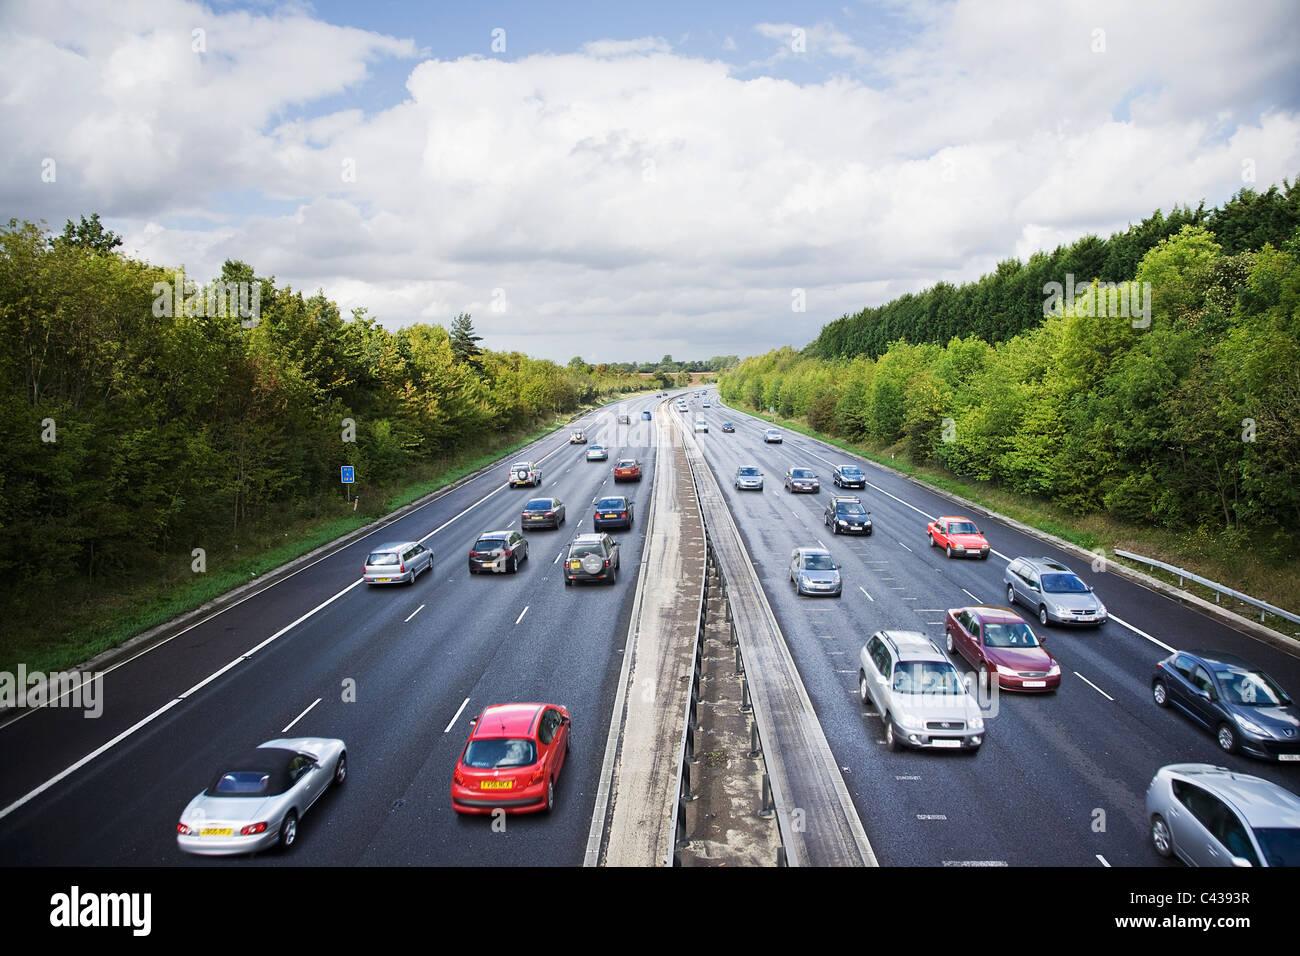 Trafficata autostrada britannica Immagini Stock